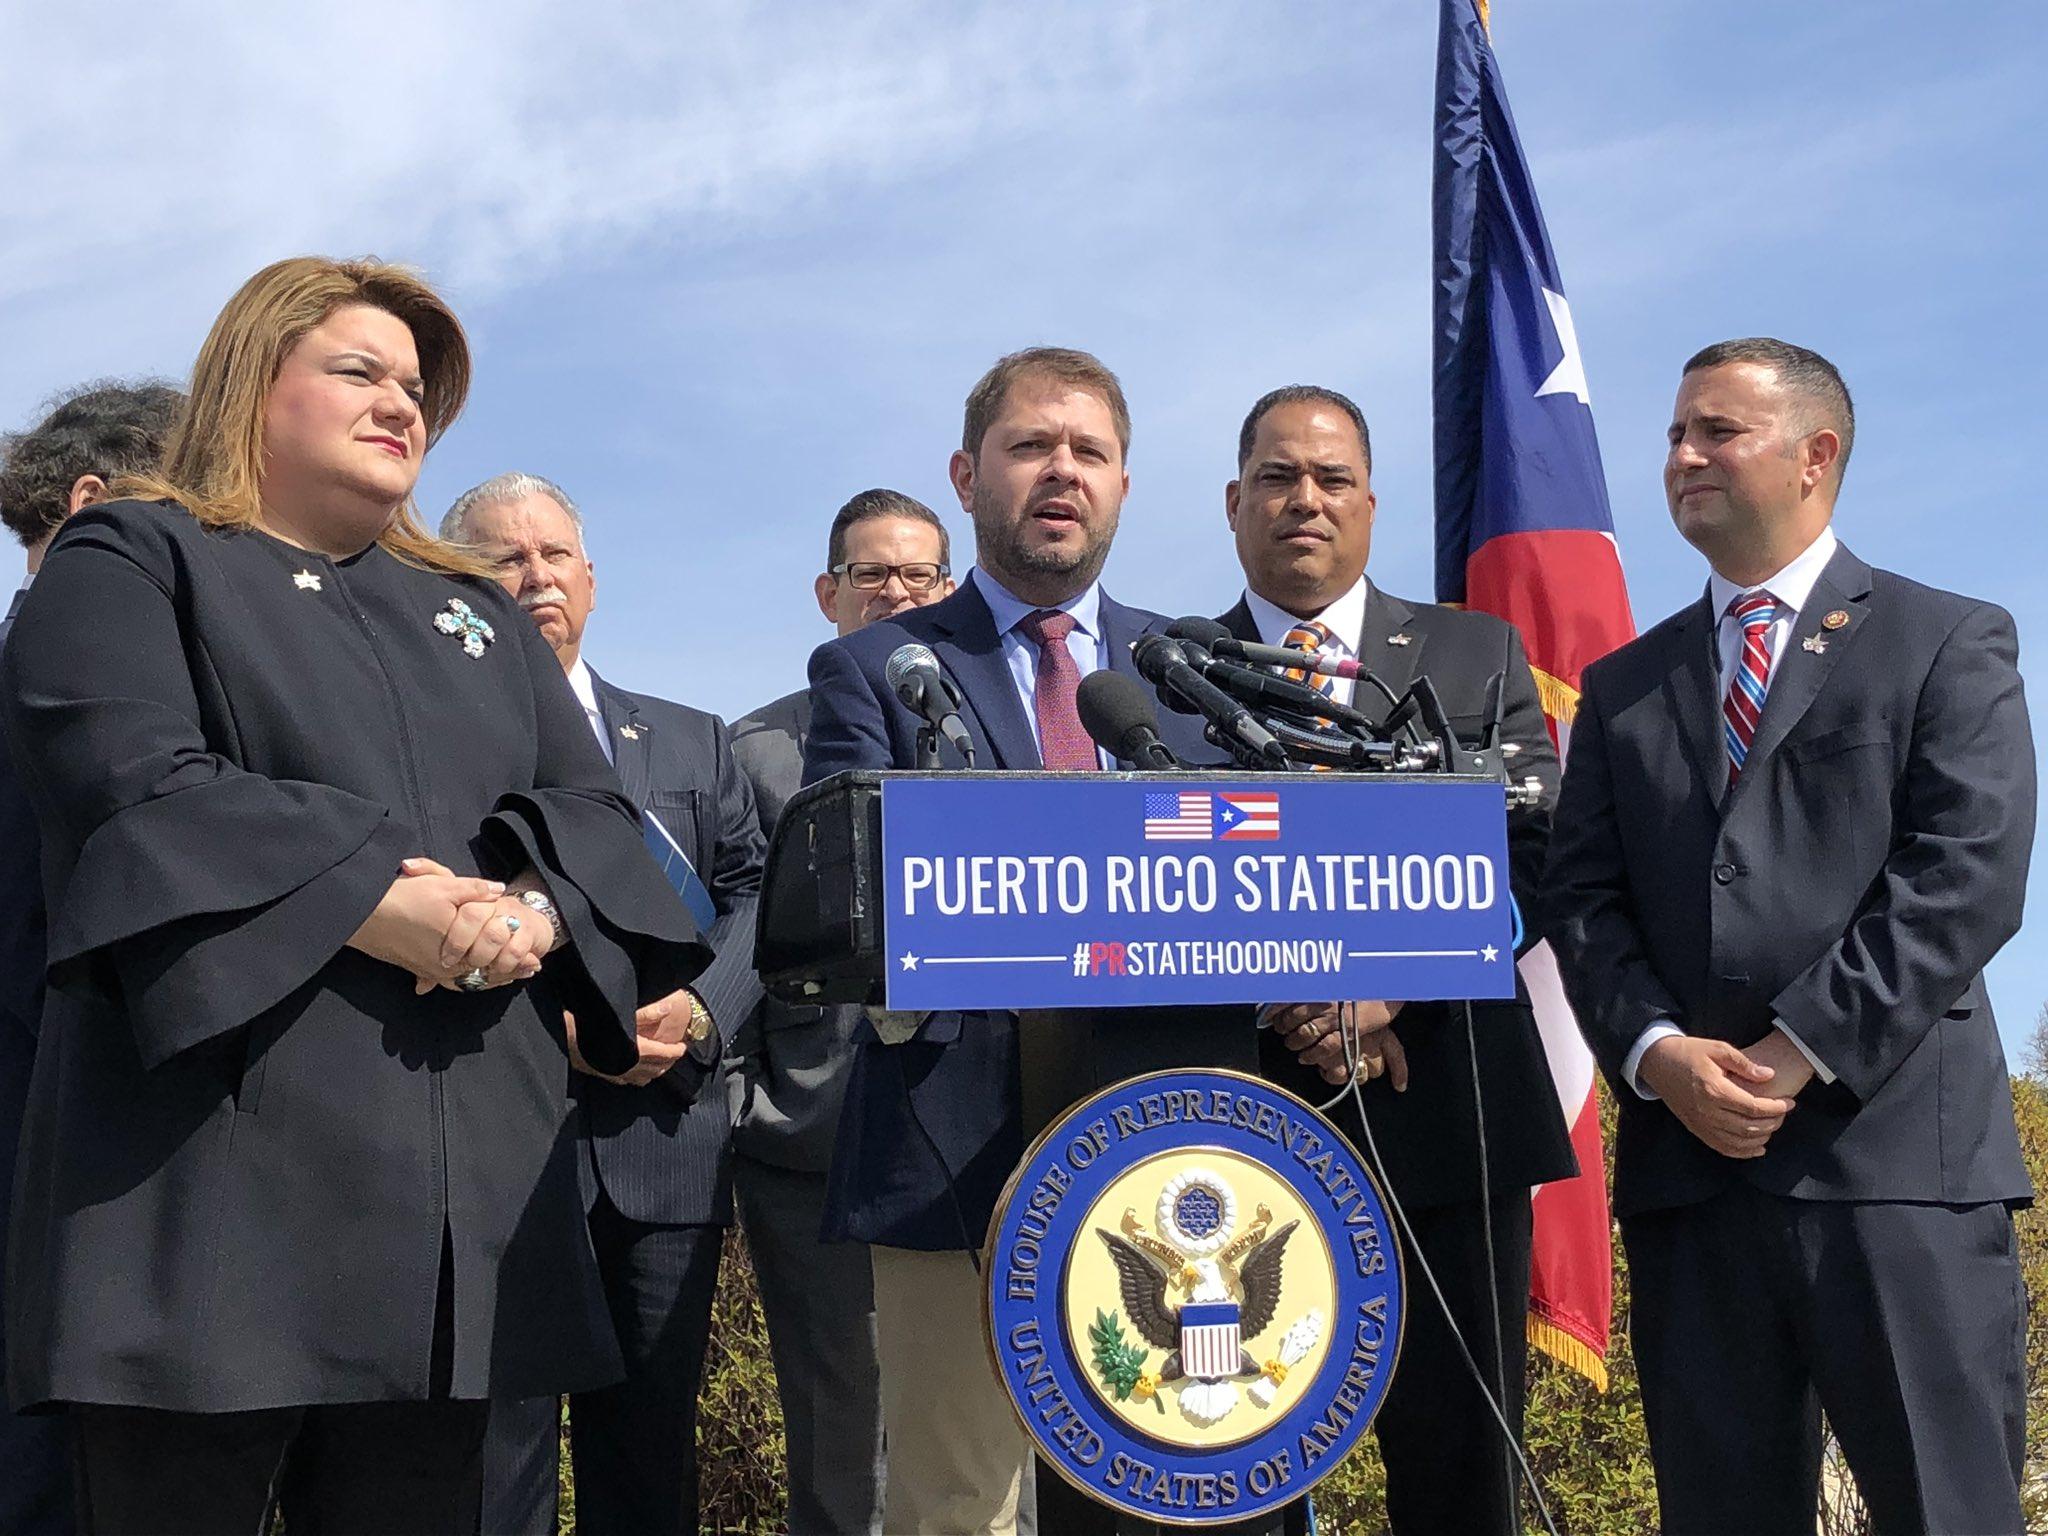 File:Puerto Rico Statehood - Gallego 2019.jpg - Wikimedia Commons